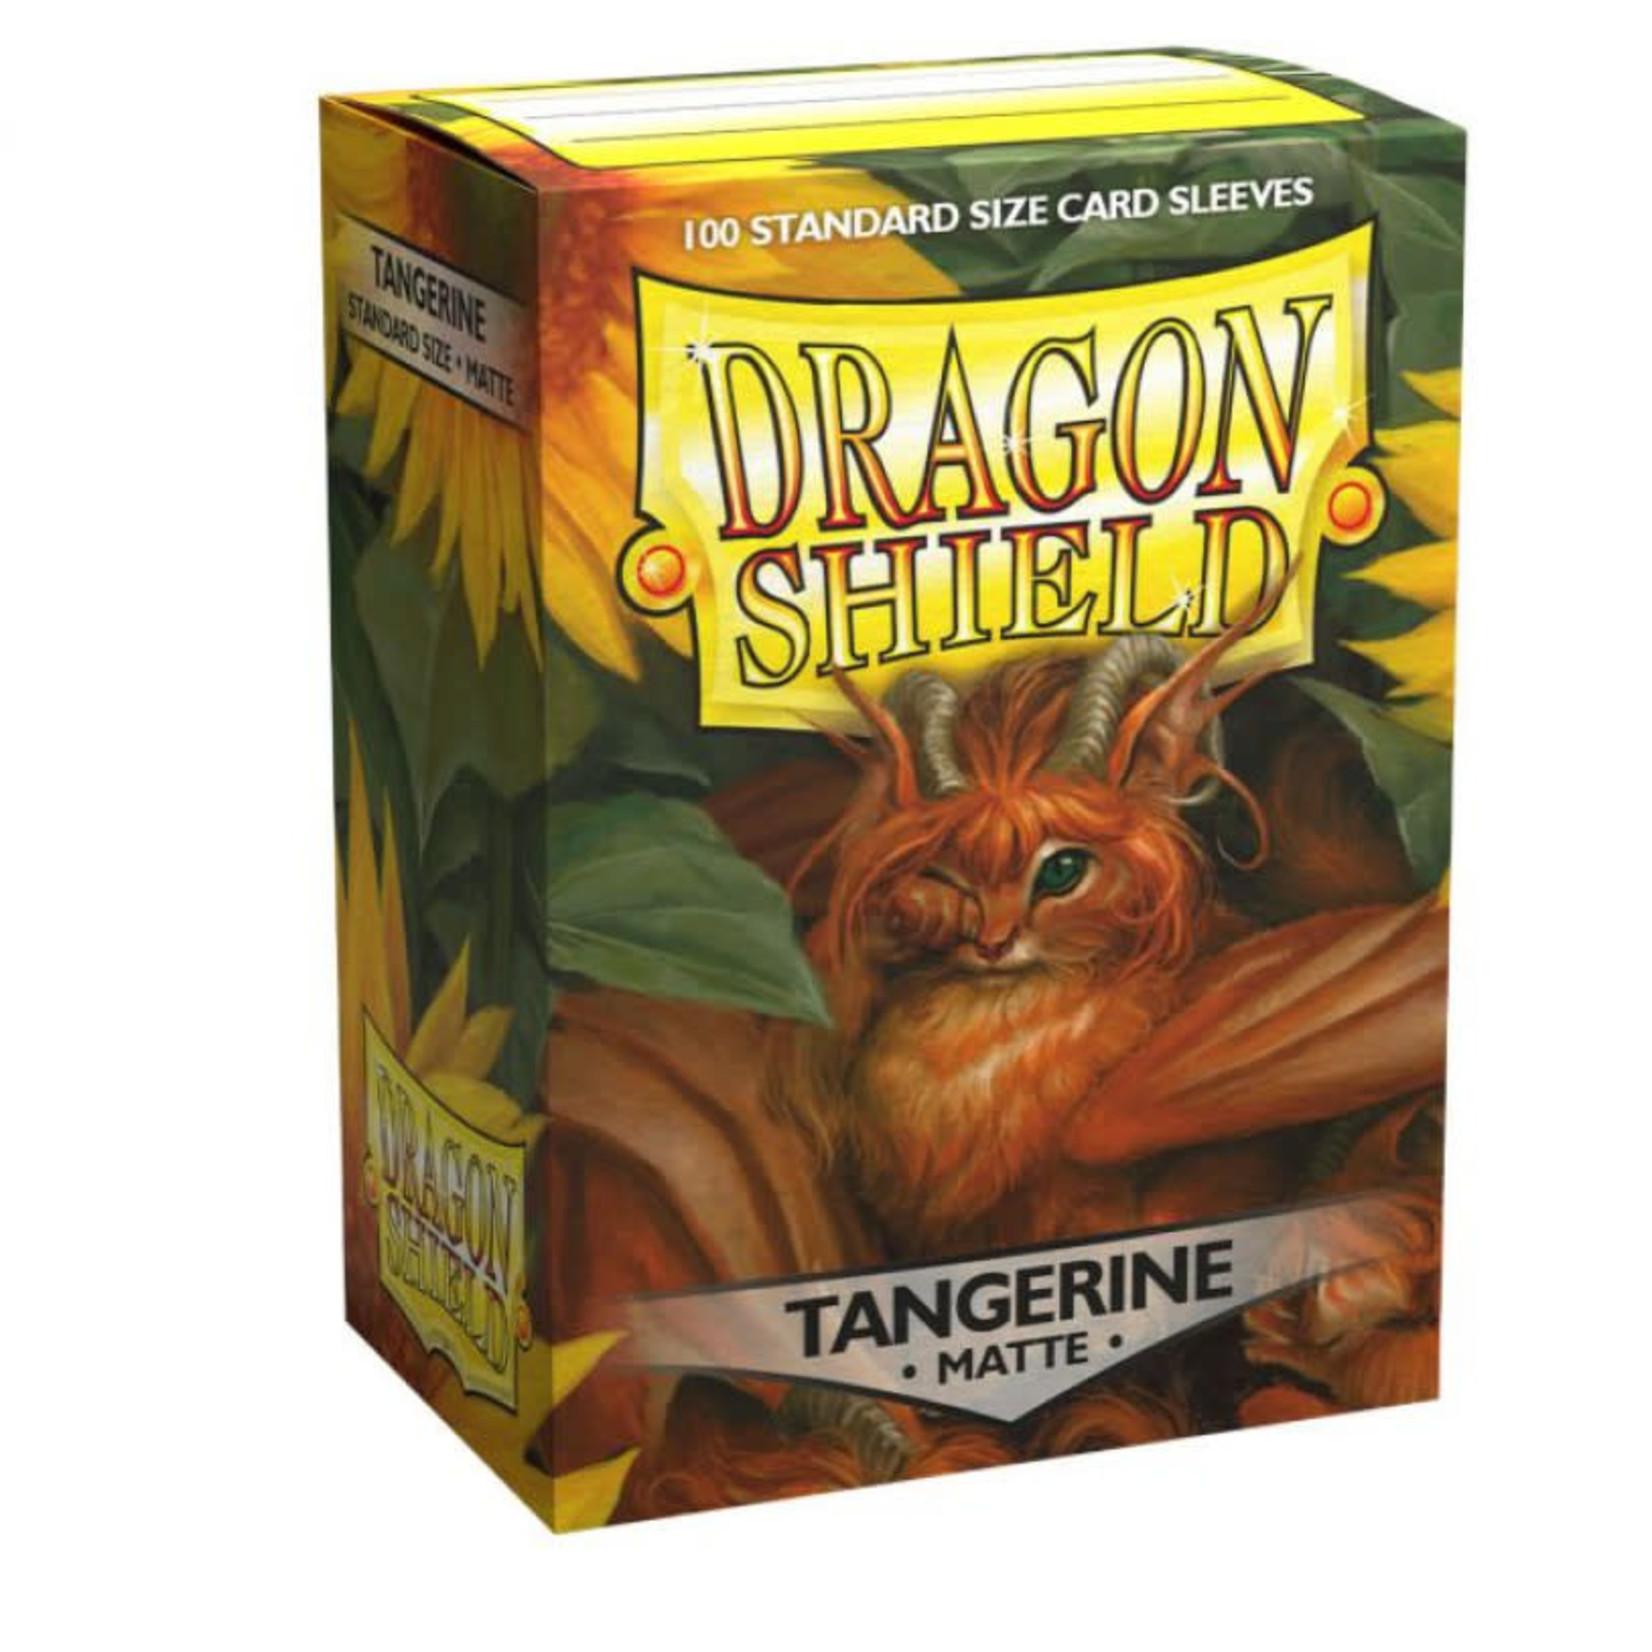 Arcane Tinmen Dragon Shield Matte Tangerine